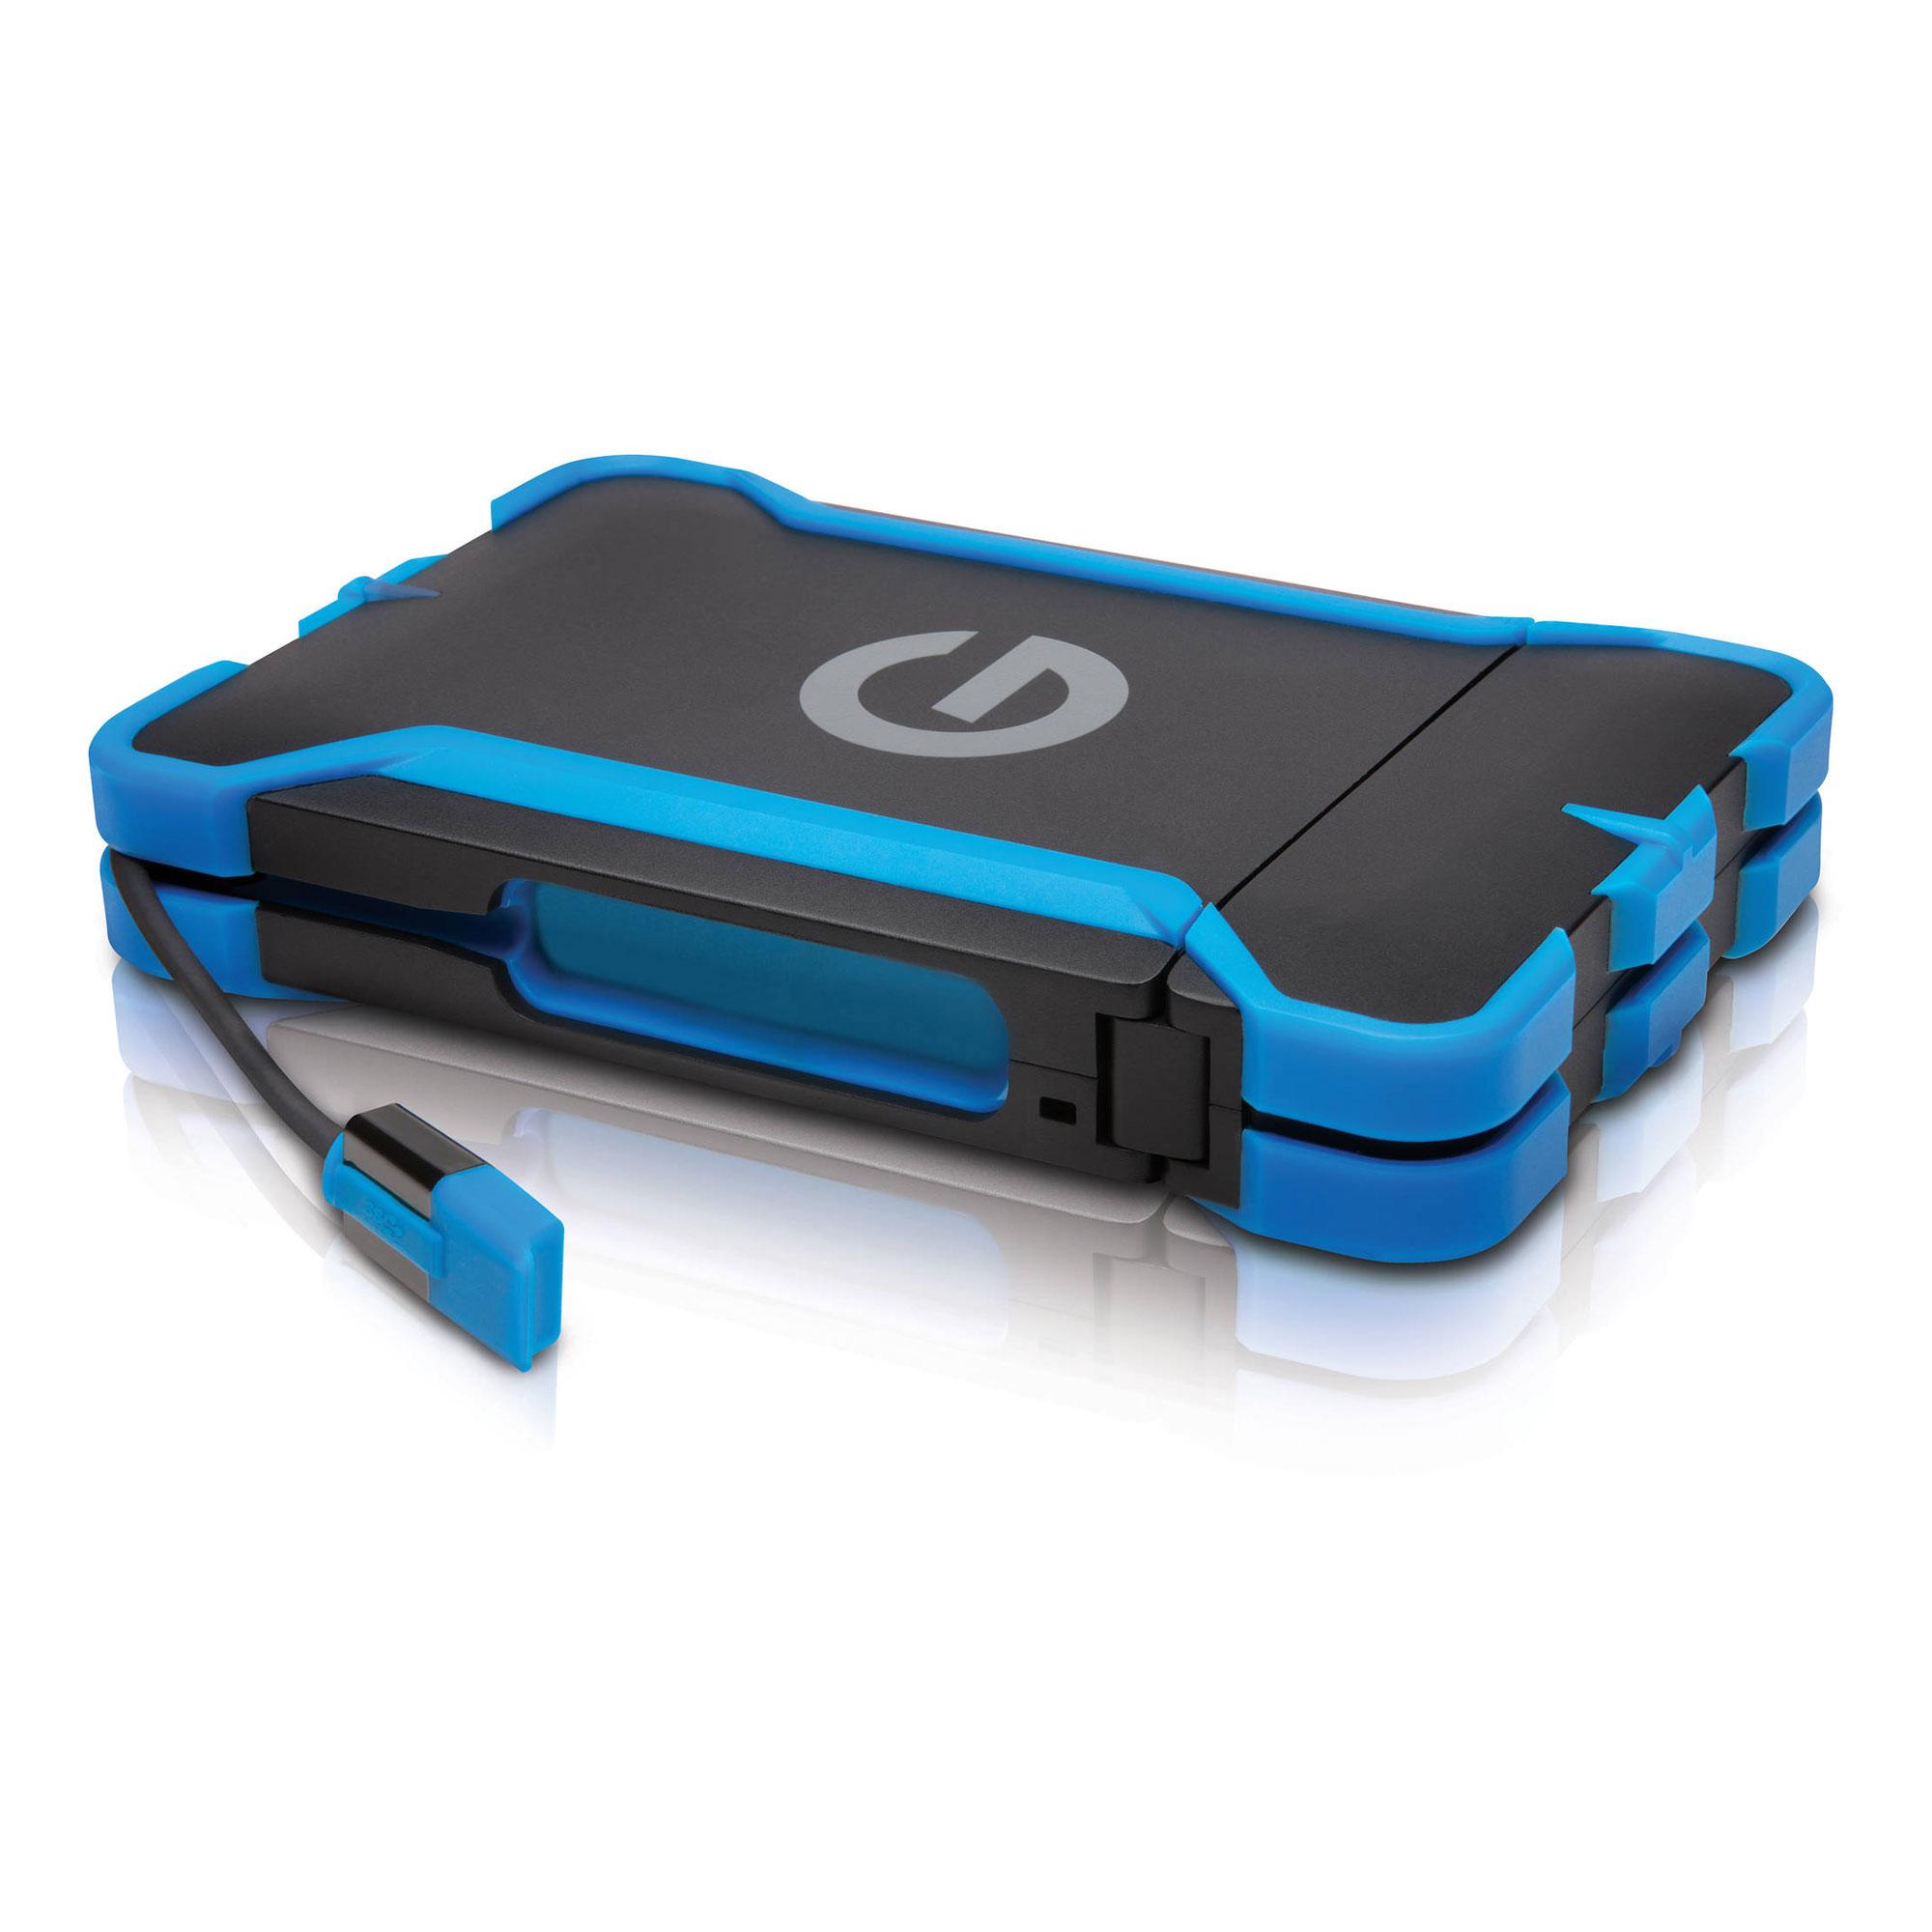 1TB G-DRIVE ev ATC with USB 3.0